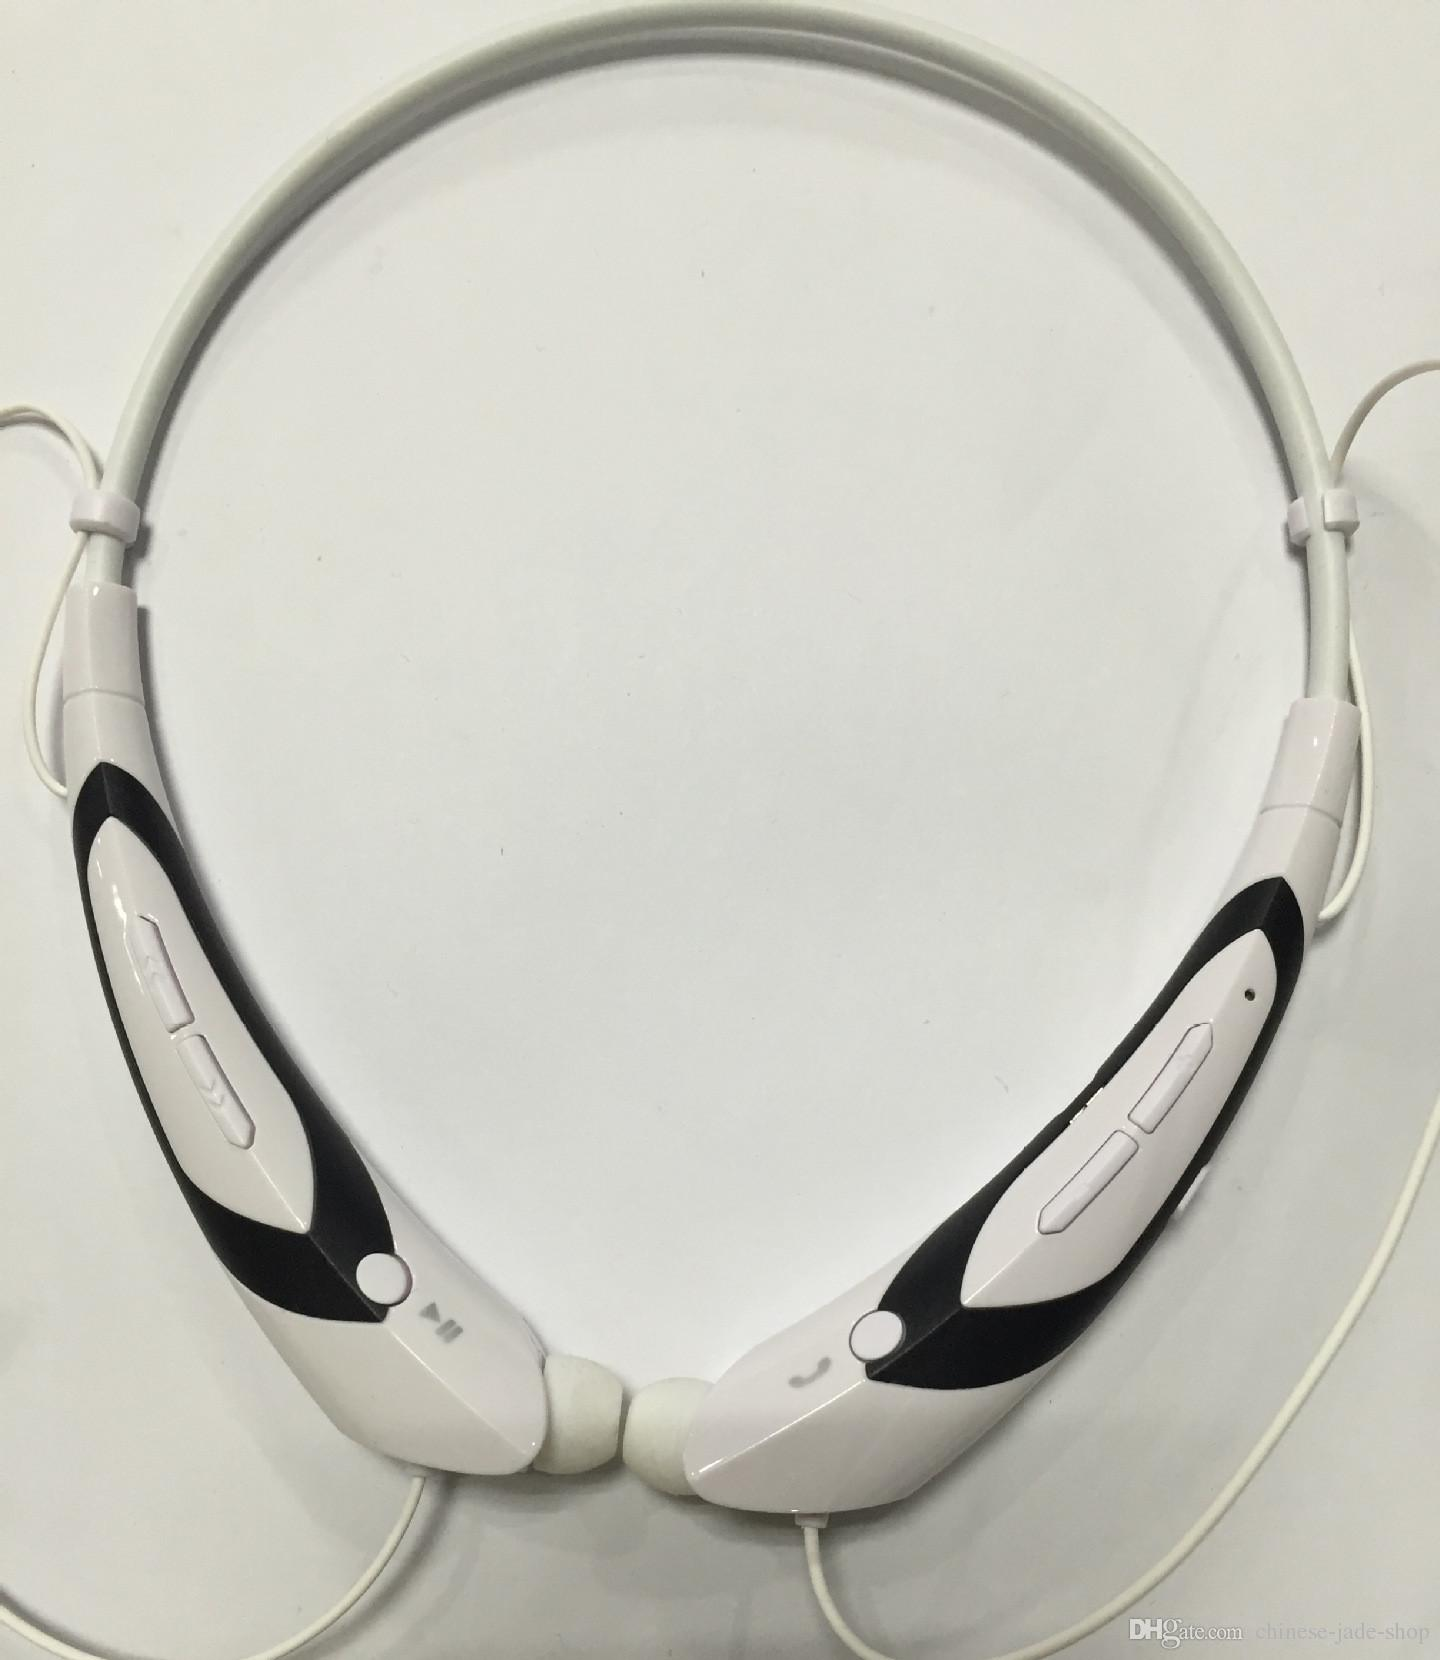 HBS760 HB-S760 Draadloze Bluetooth V4.0 Headset In-Ear Hoofdtelefoon Neckband Stereo met Micro-Oortelefoon voor Sport / Party Simple Opp